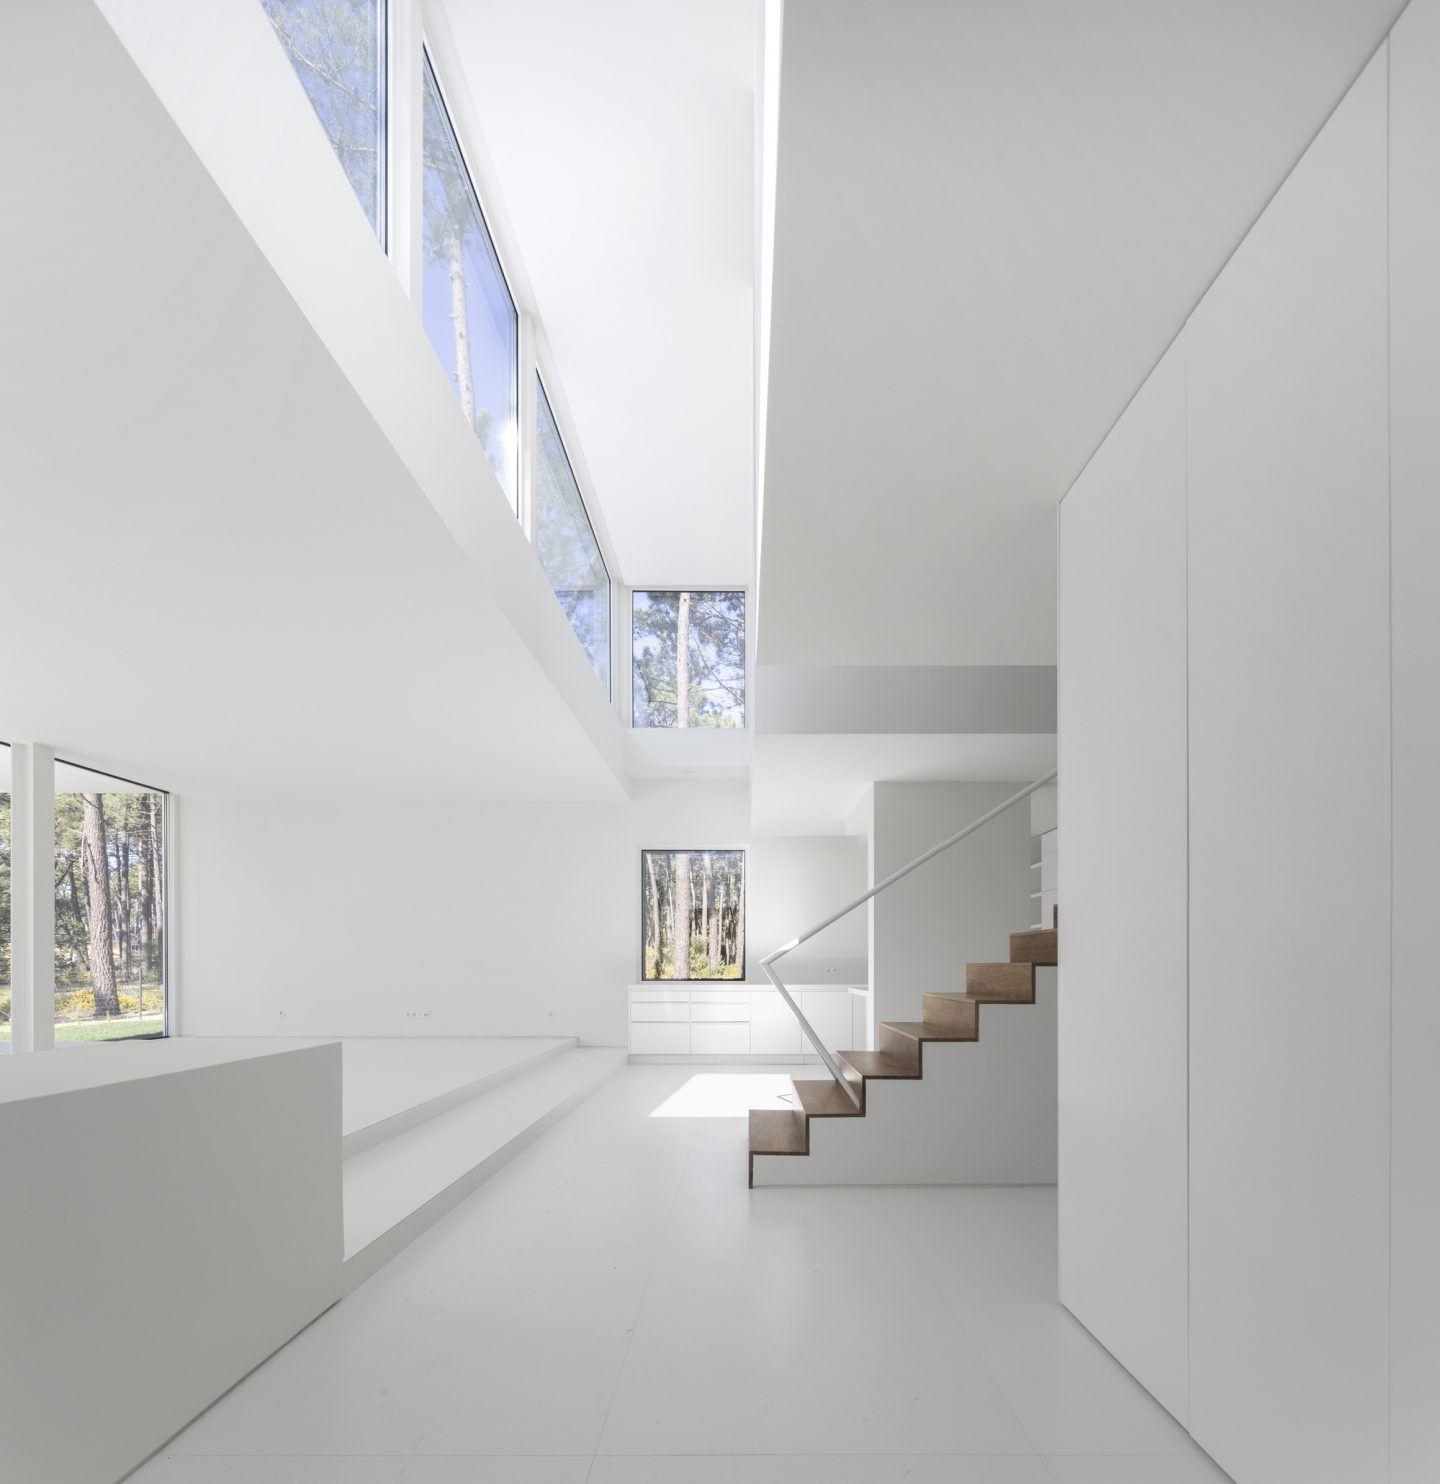 IGNANT-Architecture-Bica-Arquitectos-Herdade-da-Aroeira-House-002